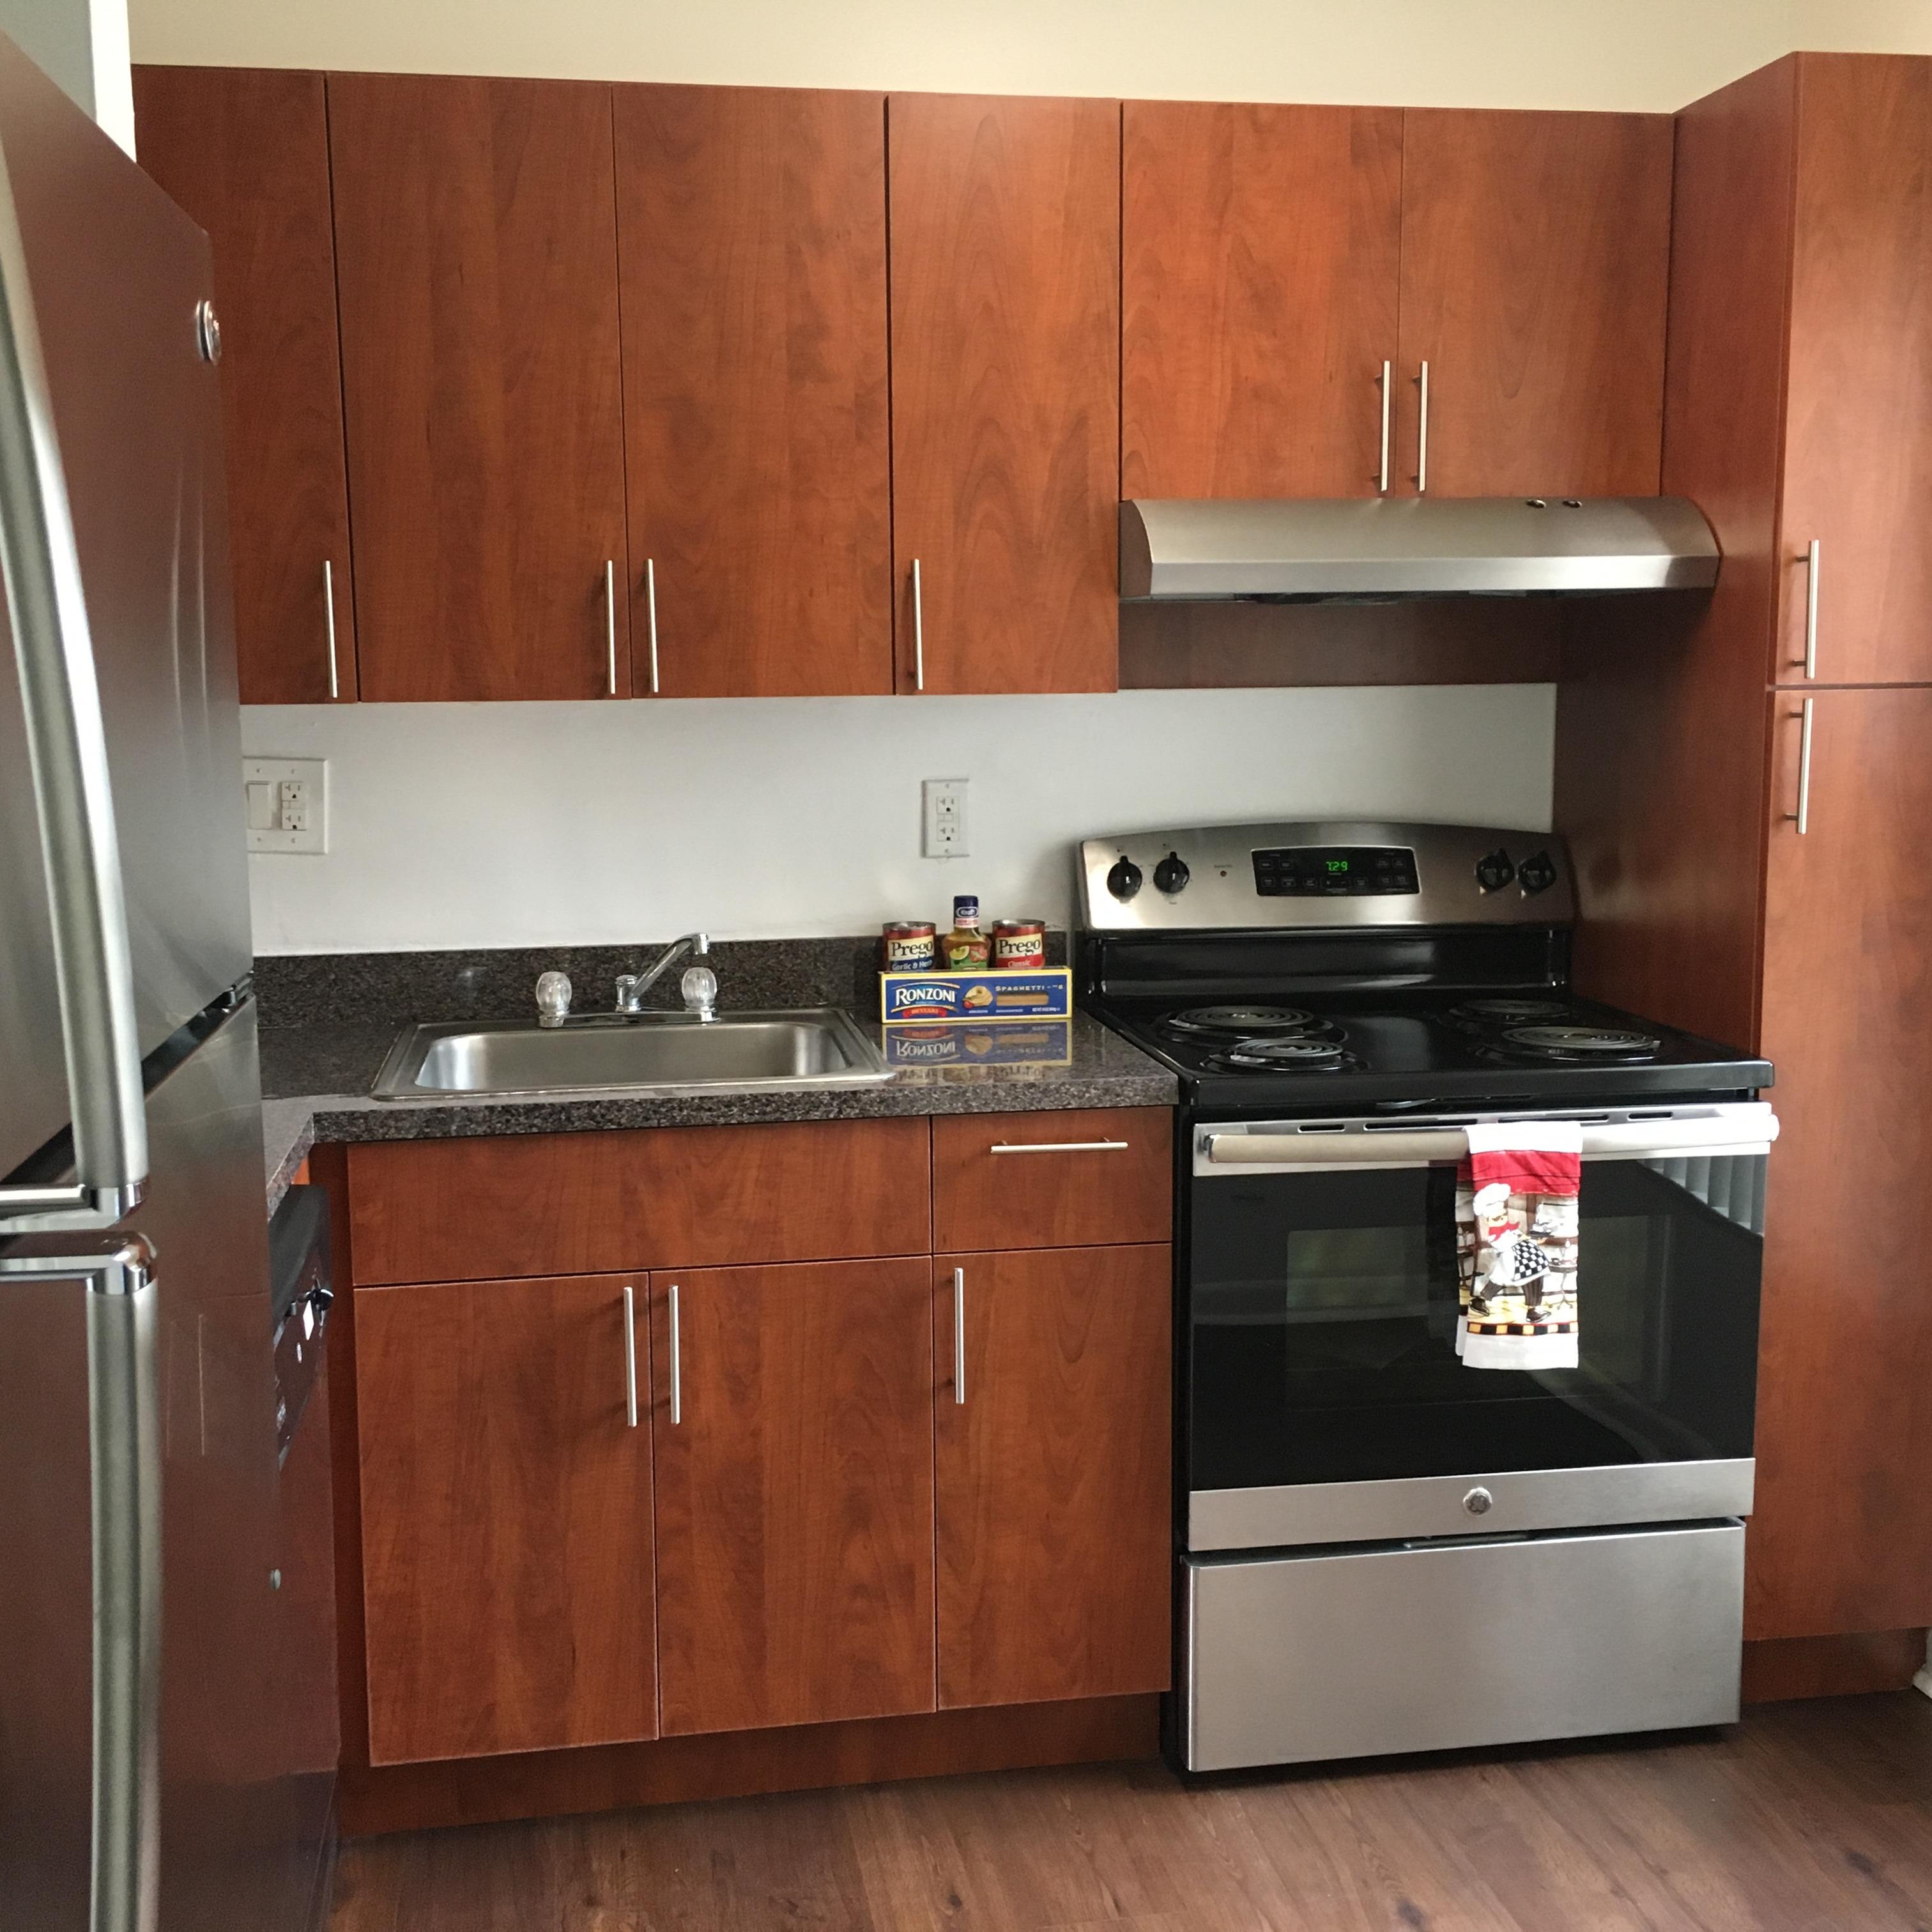 Cypress Trace Apartments: Woodland Meadows, Tamarac Florida (FL)